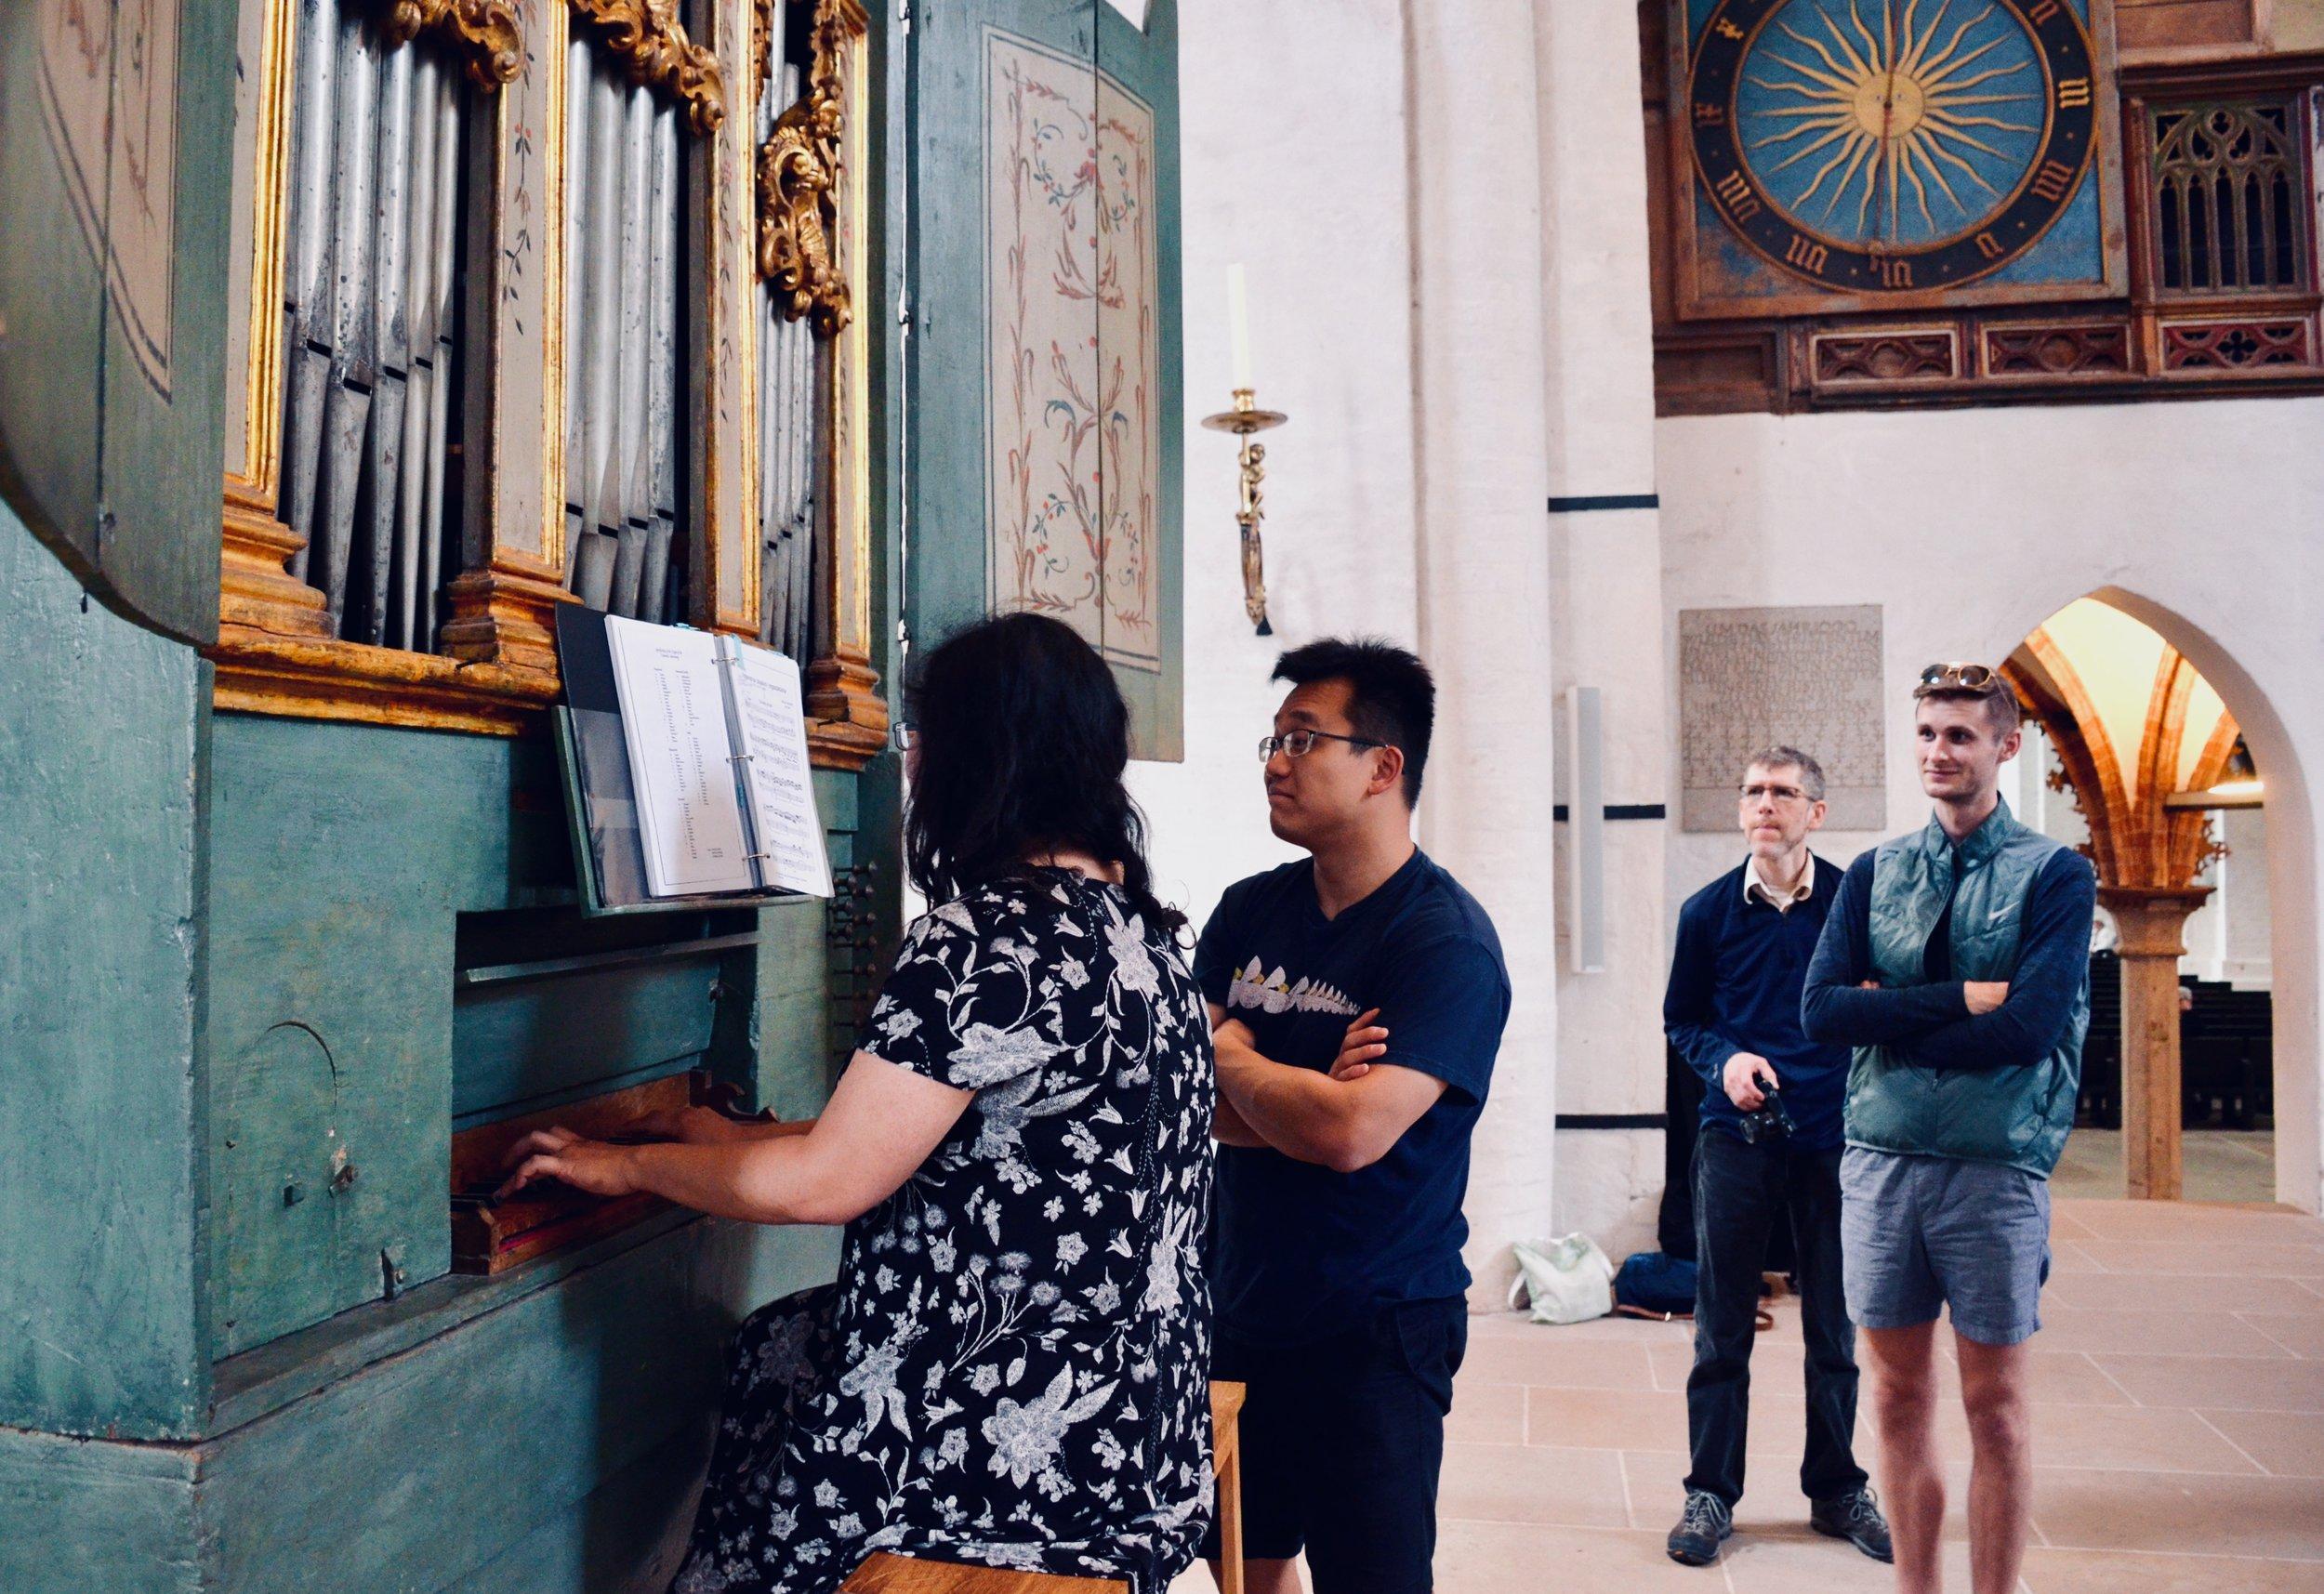 Jennifer Hsiao plays the 1777 Italian Baroque organ in Lübeck Dom.